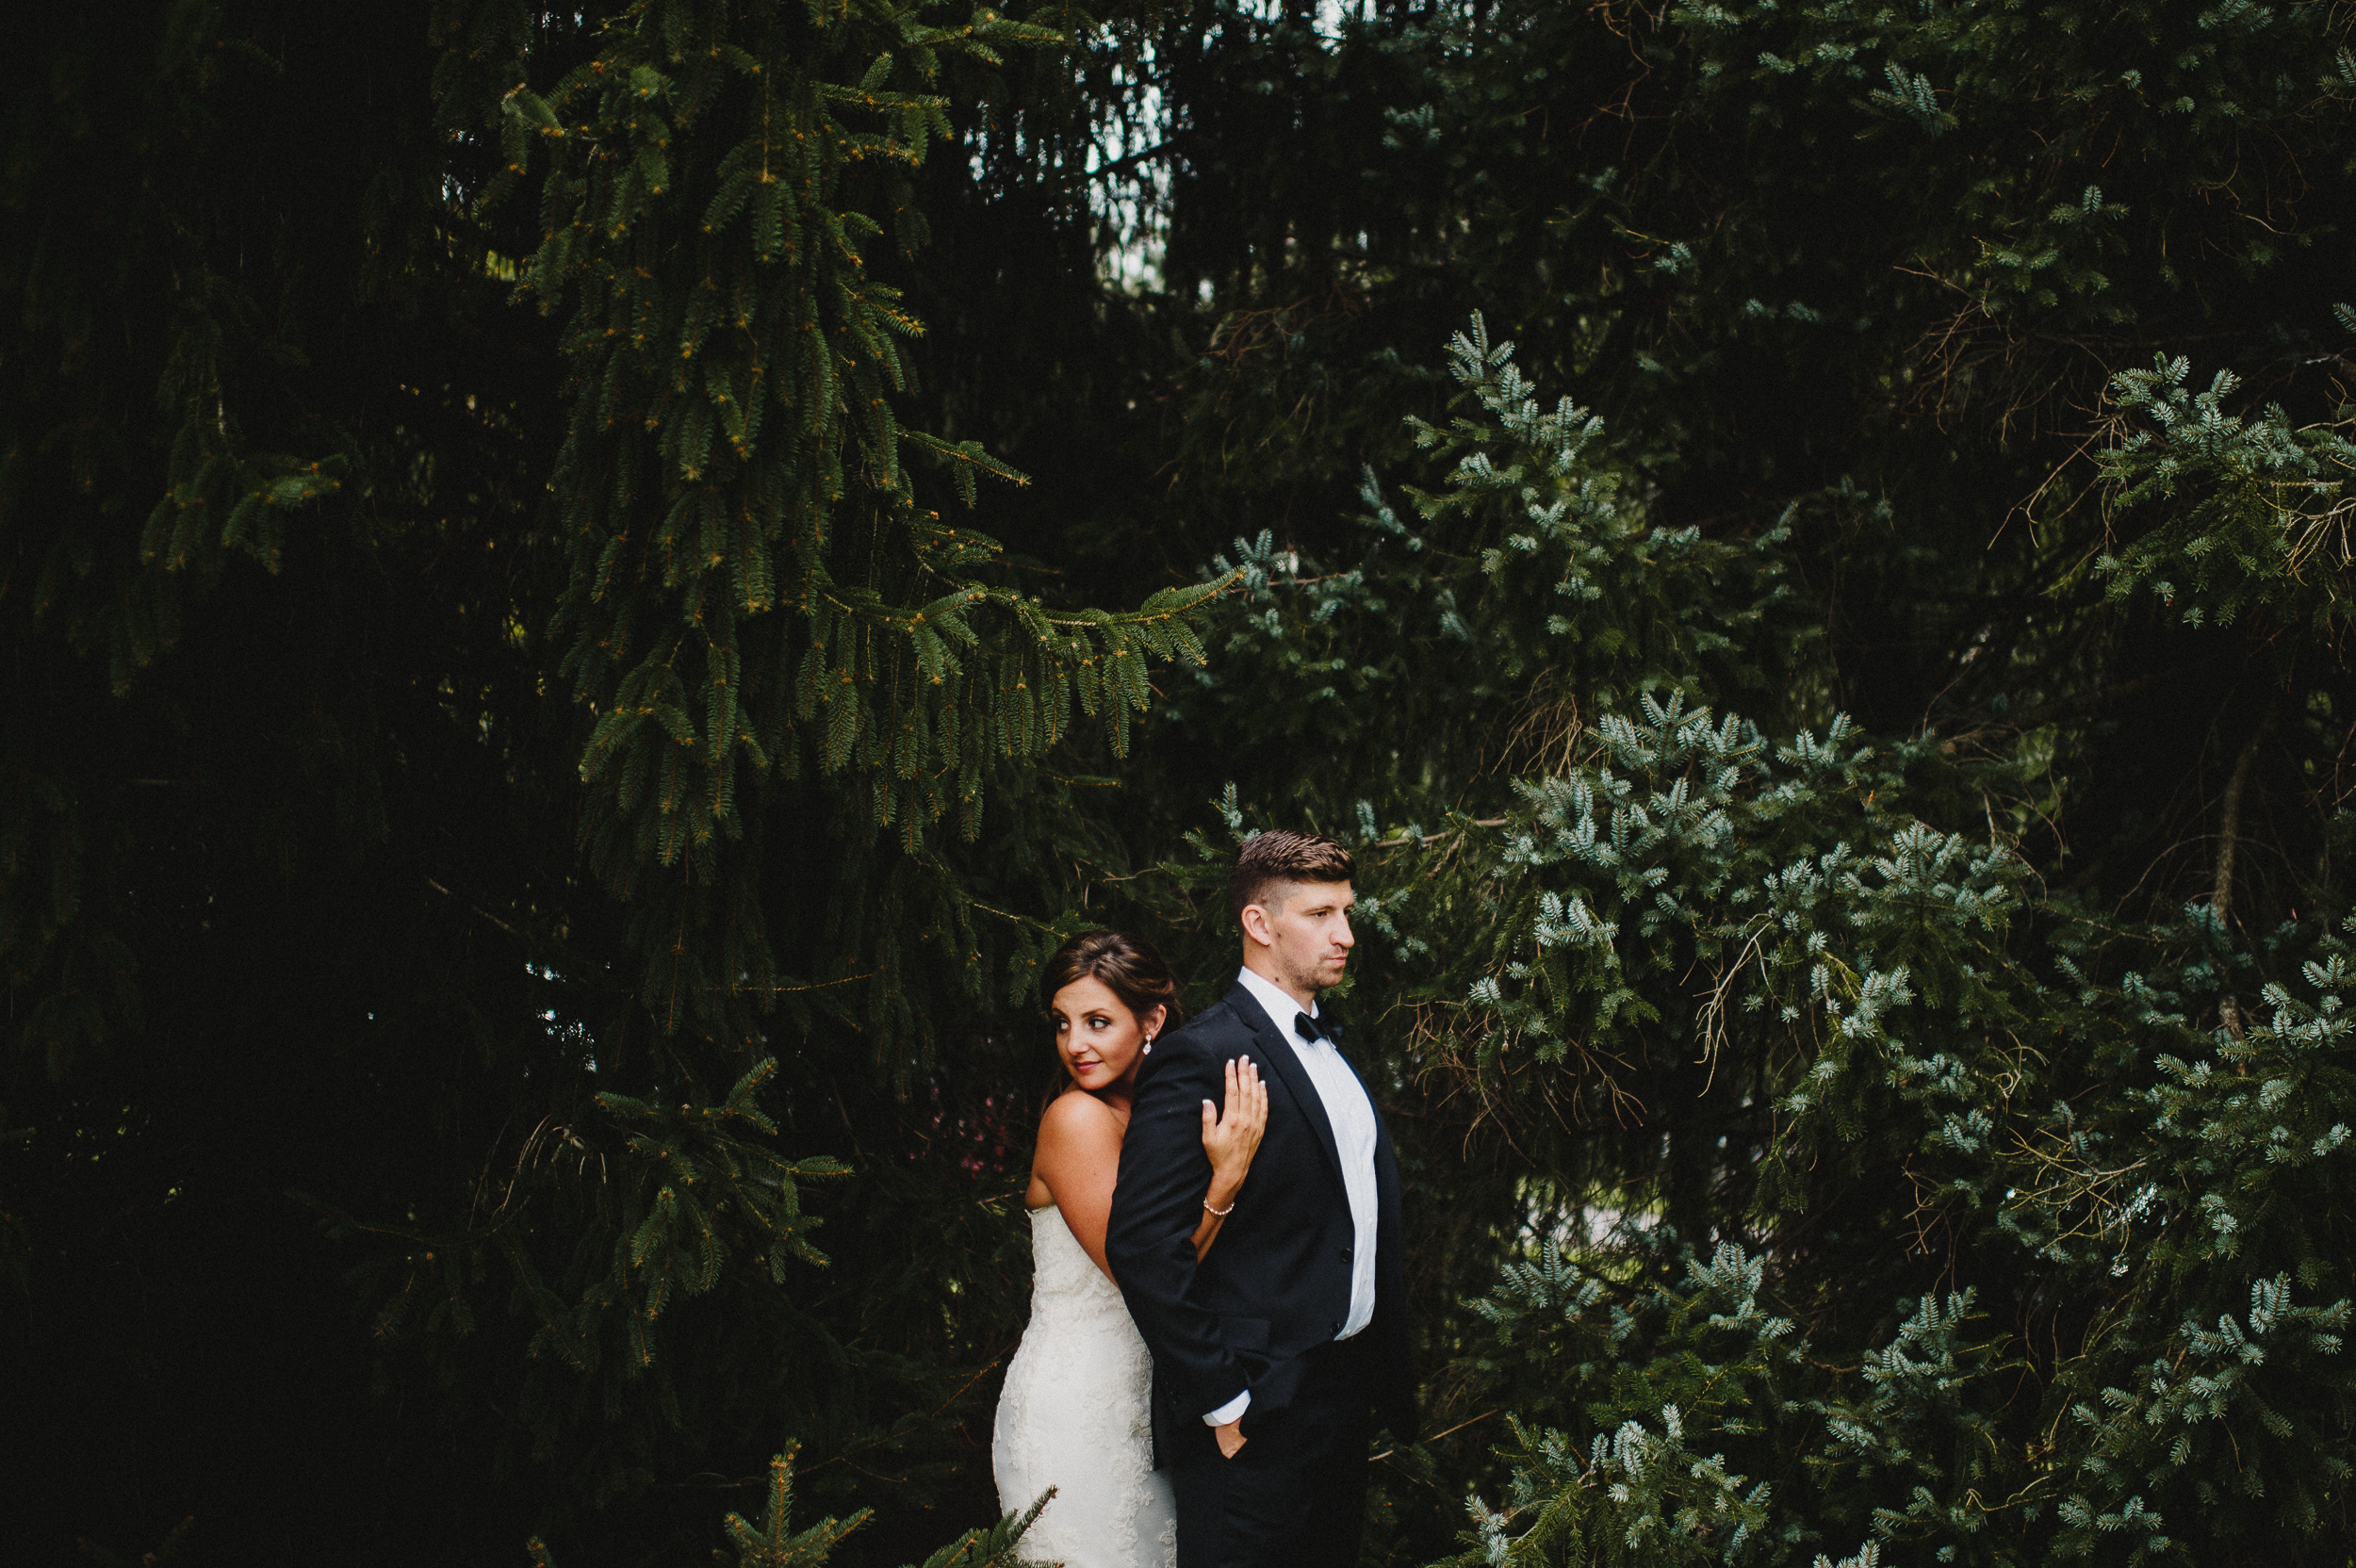 delaware-estate-wedding-photographer-pat-robinson-photography-65.jpg